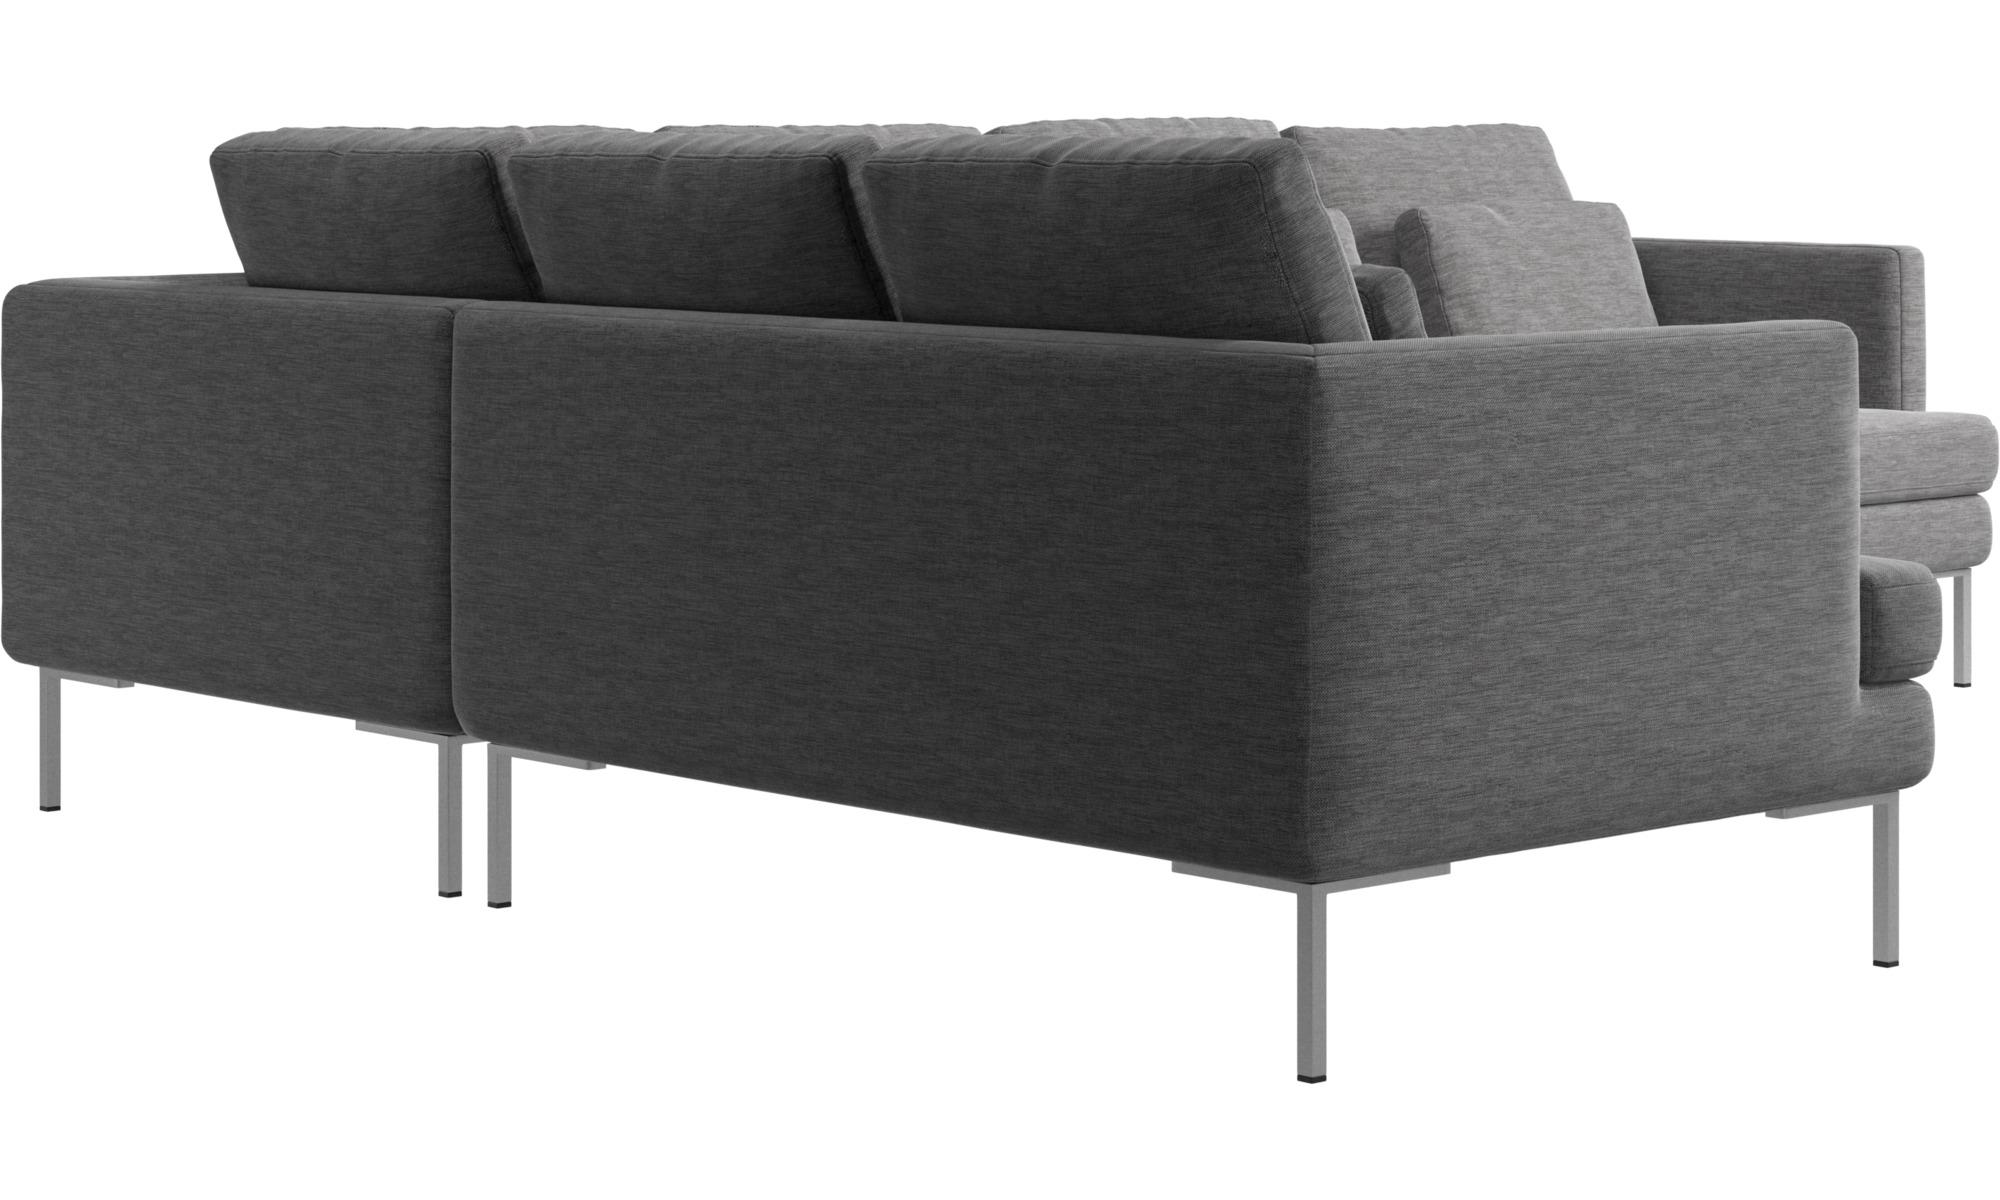 Istra 2 corner sofa